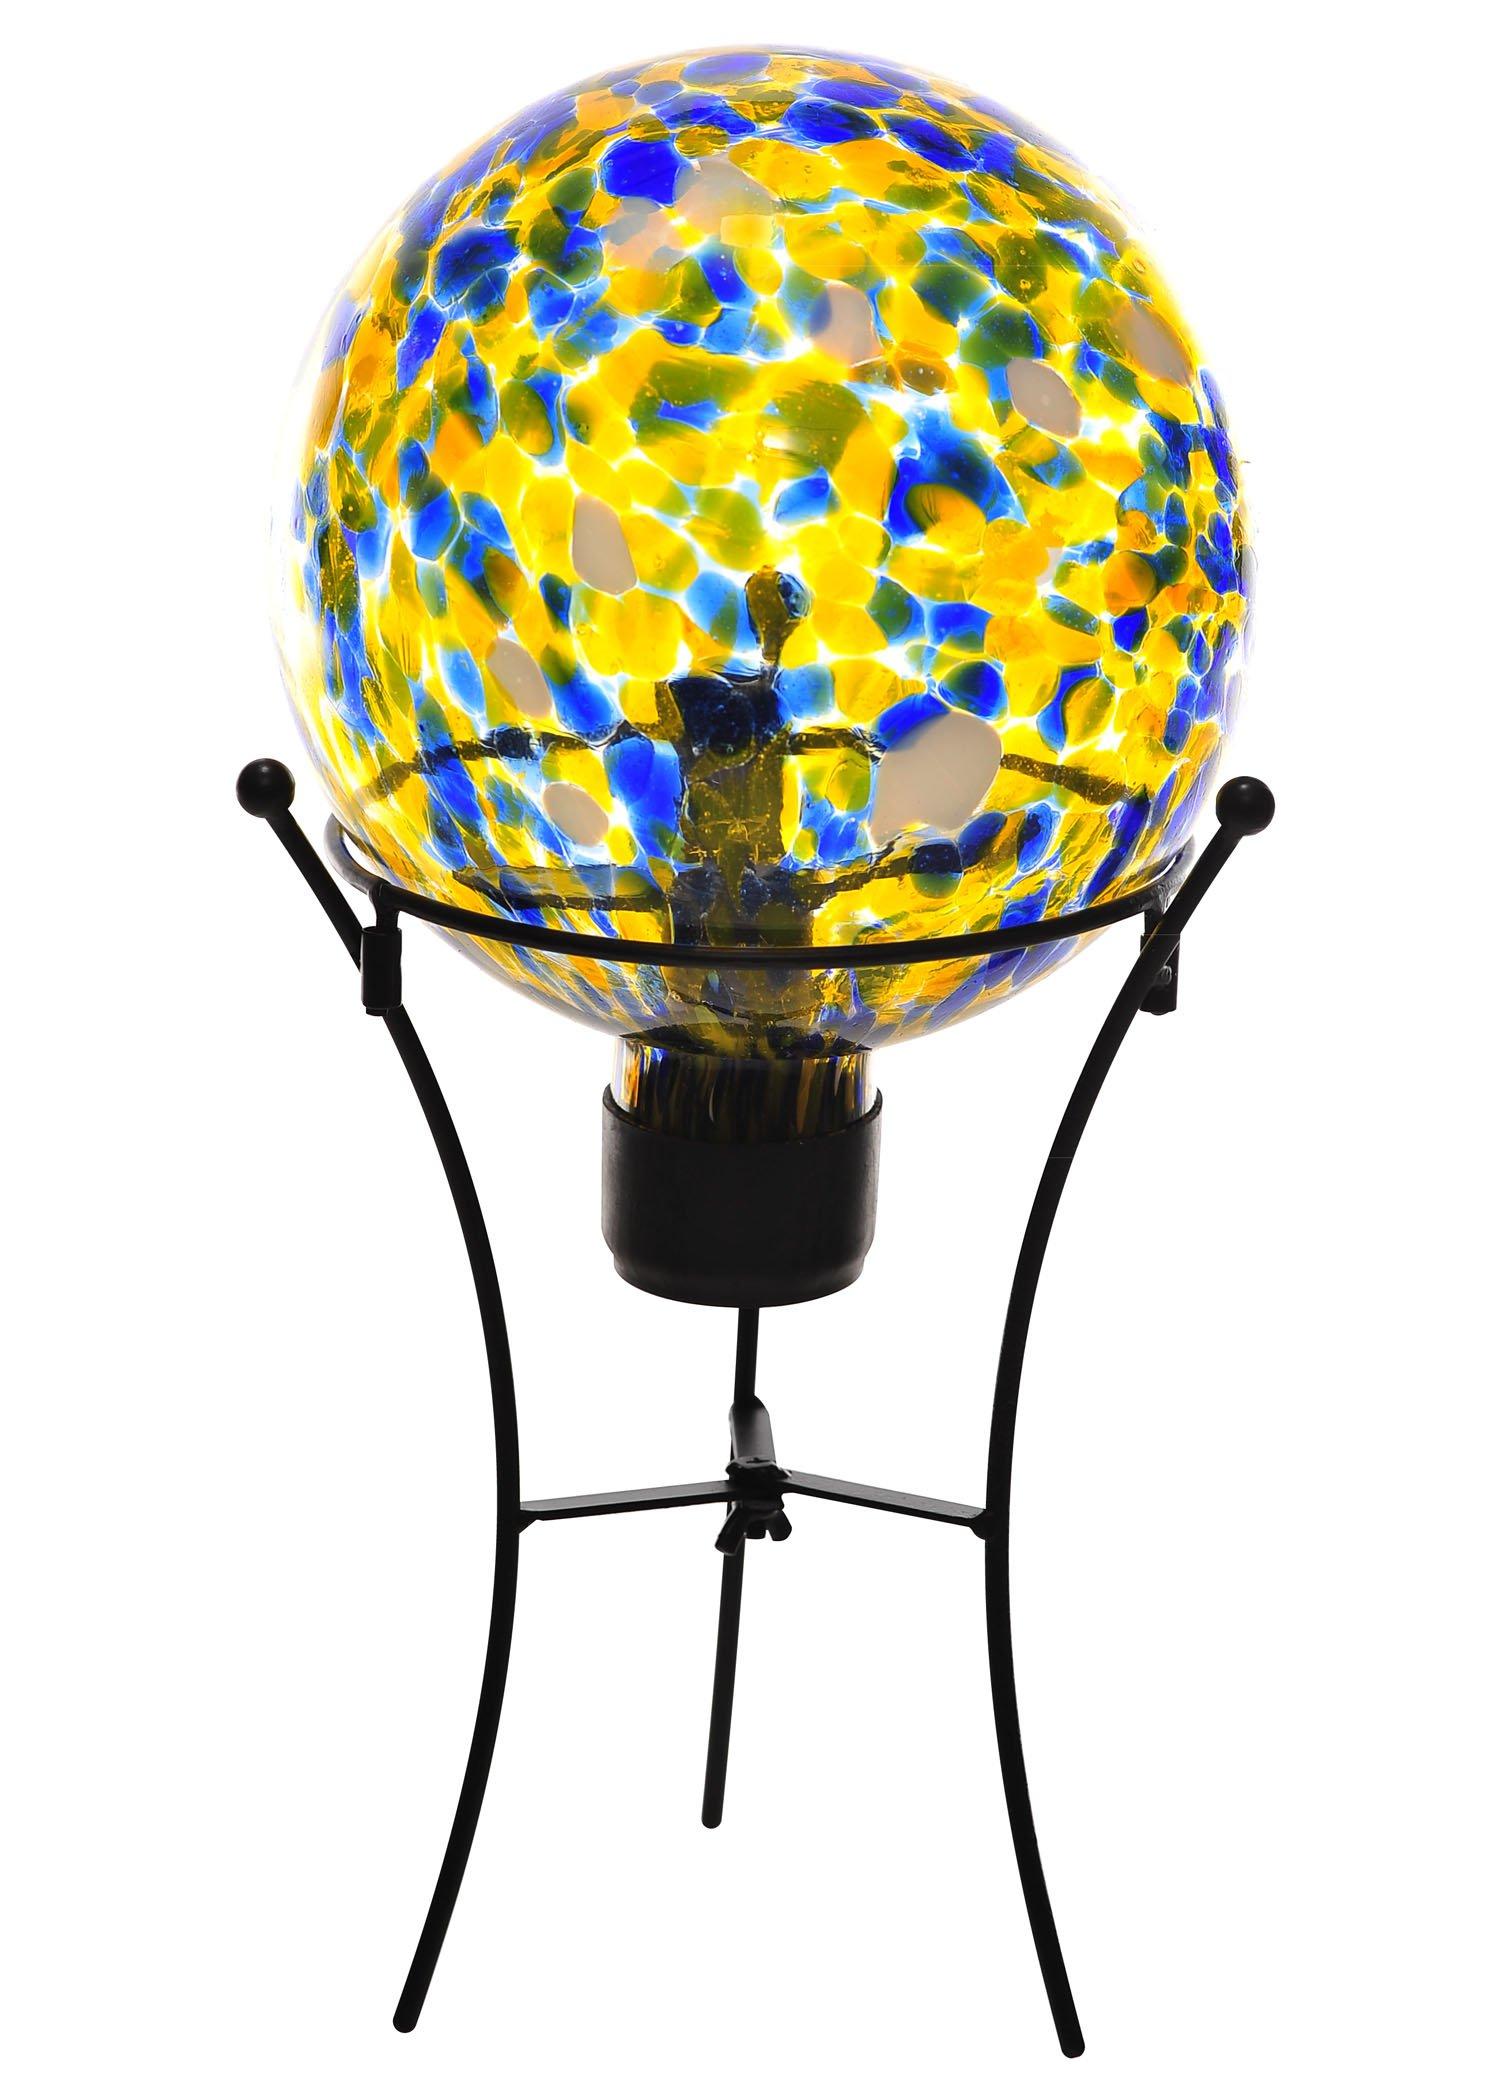 Russco III GD132215 Glass Gazing Ball, Yellow